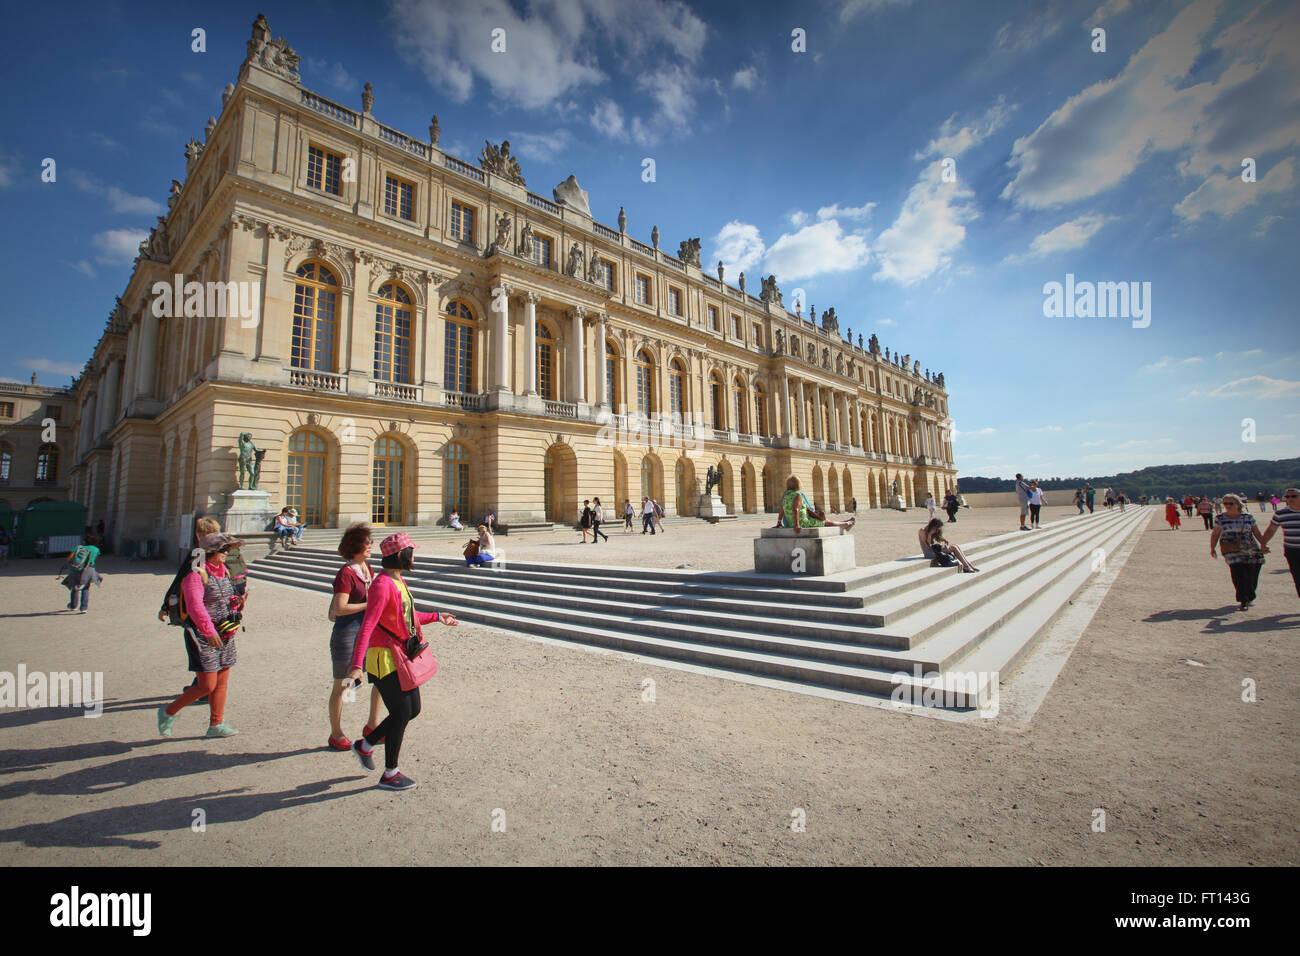 Palacio de Versalles, Versalles, cerca de París, Francia Imagen De Stock